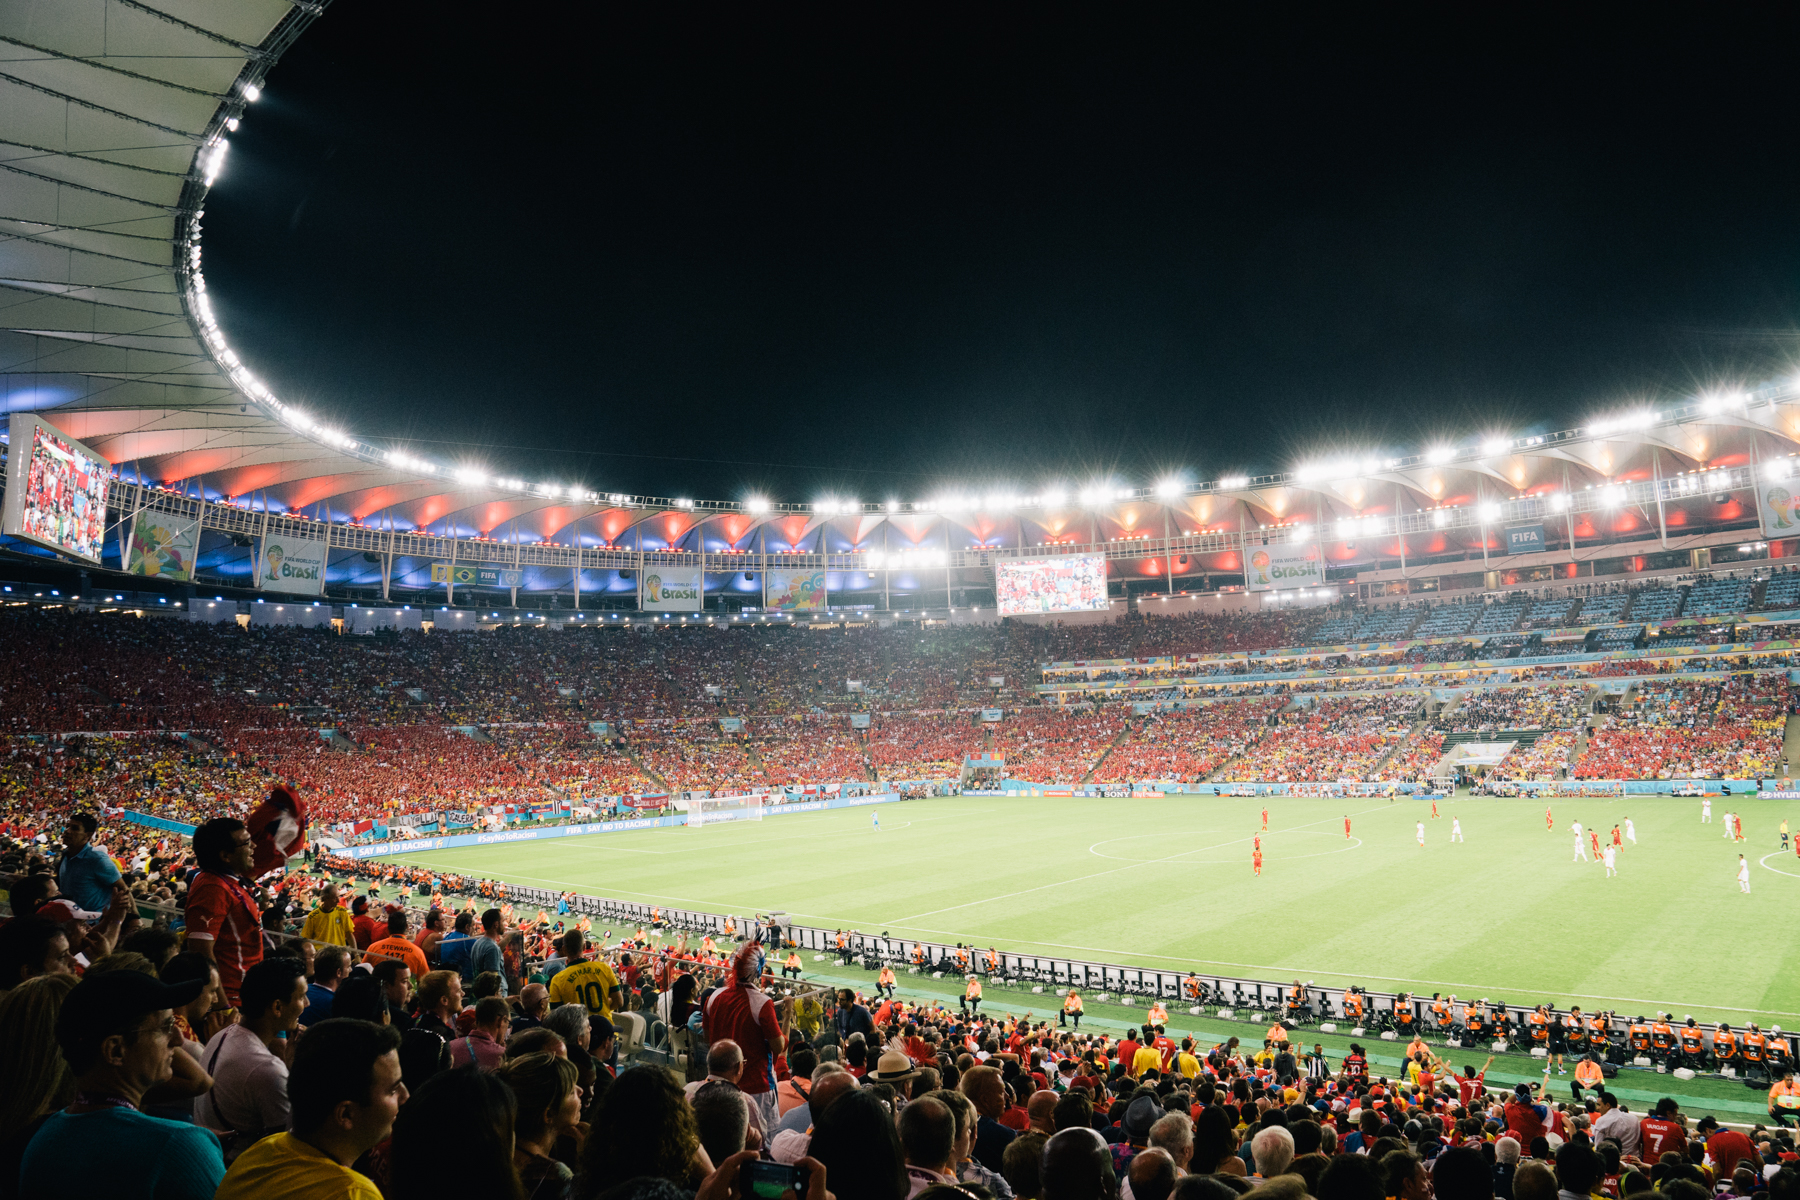 brazil-brasil-world-cup-olympics-rio-de-janeiro-maracana-stadium-2